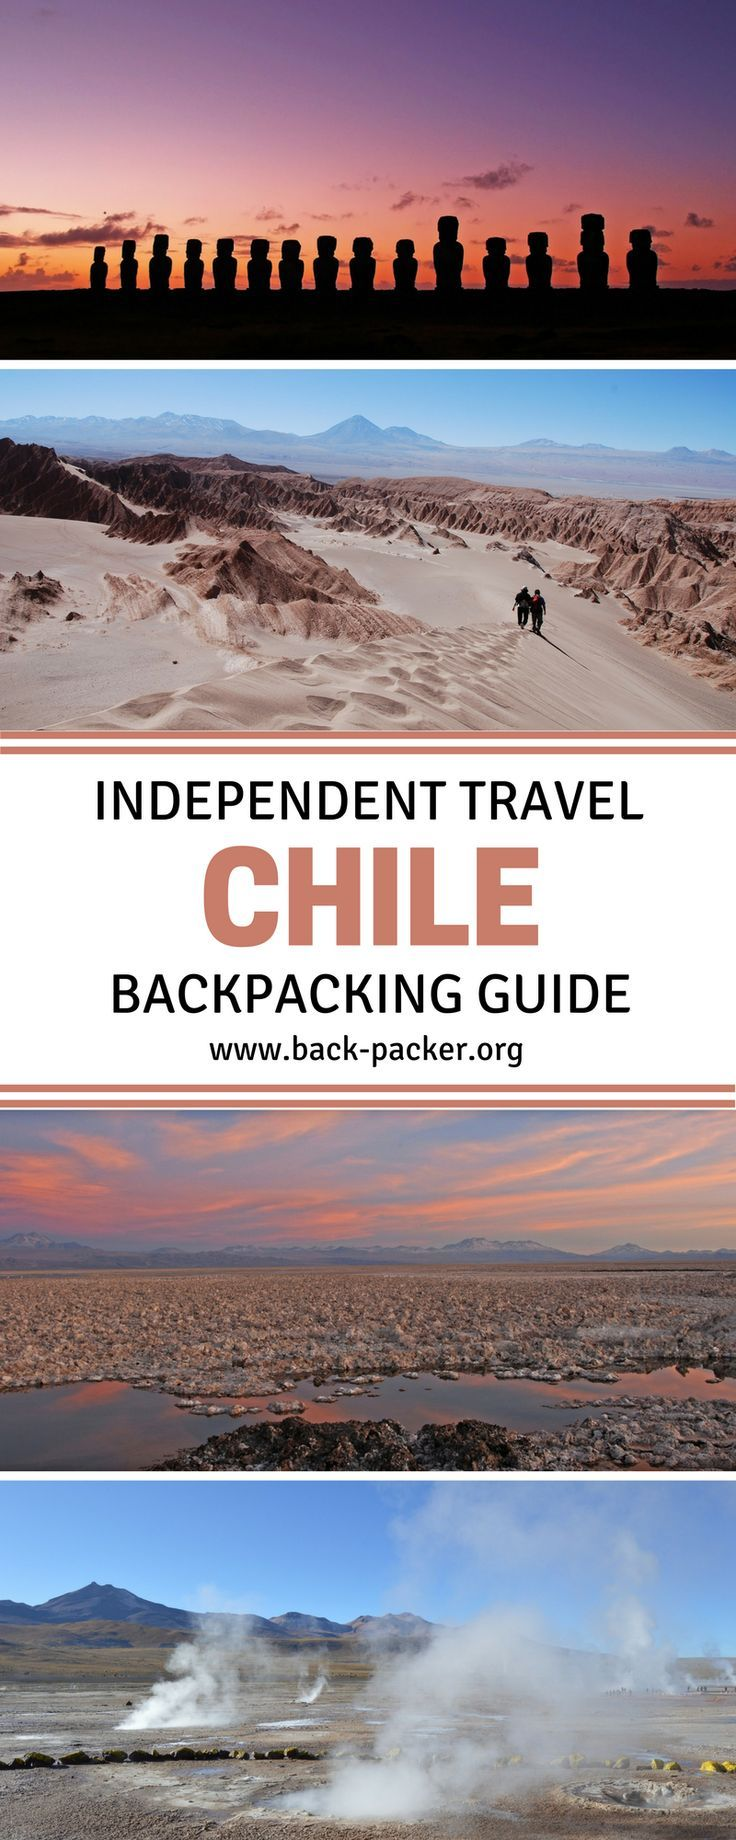 International sex guide chile